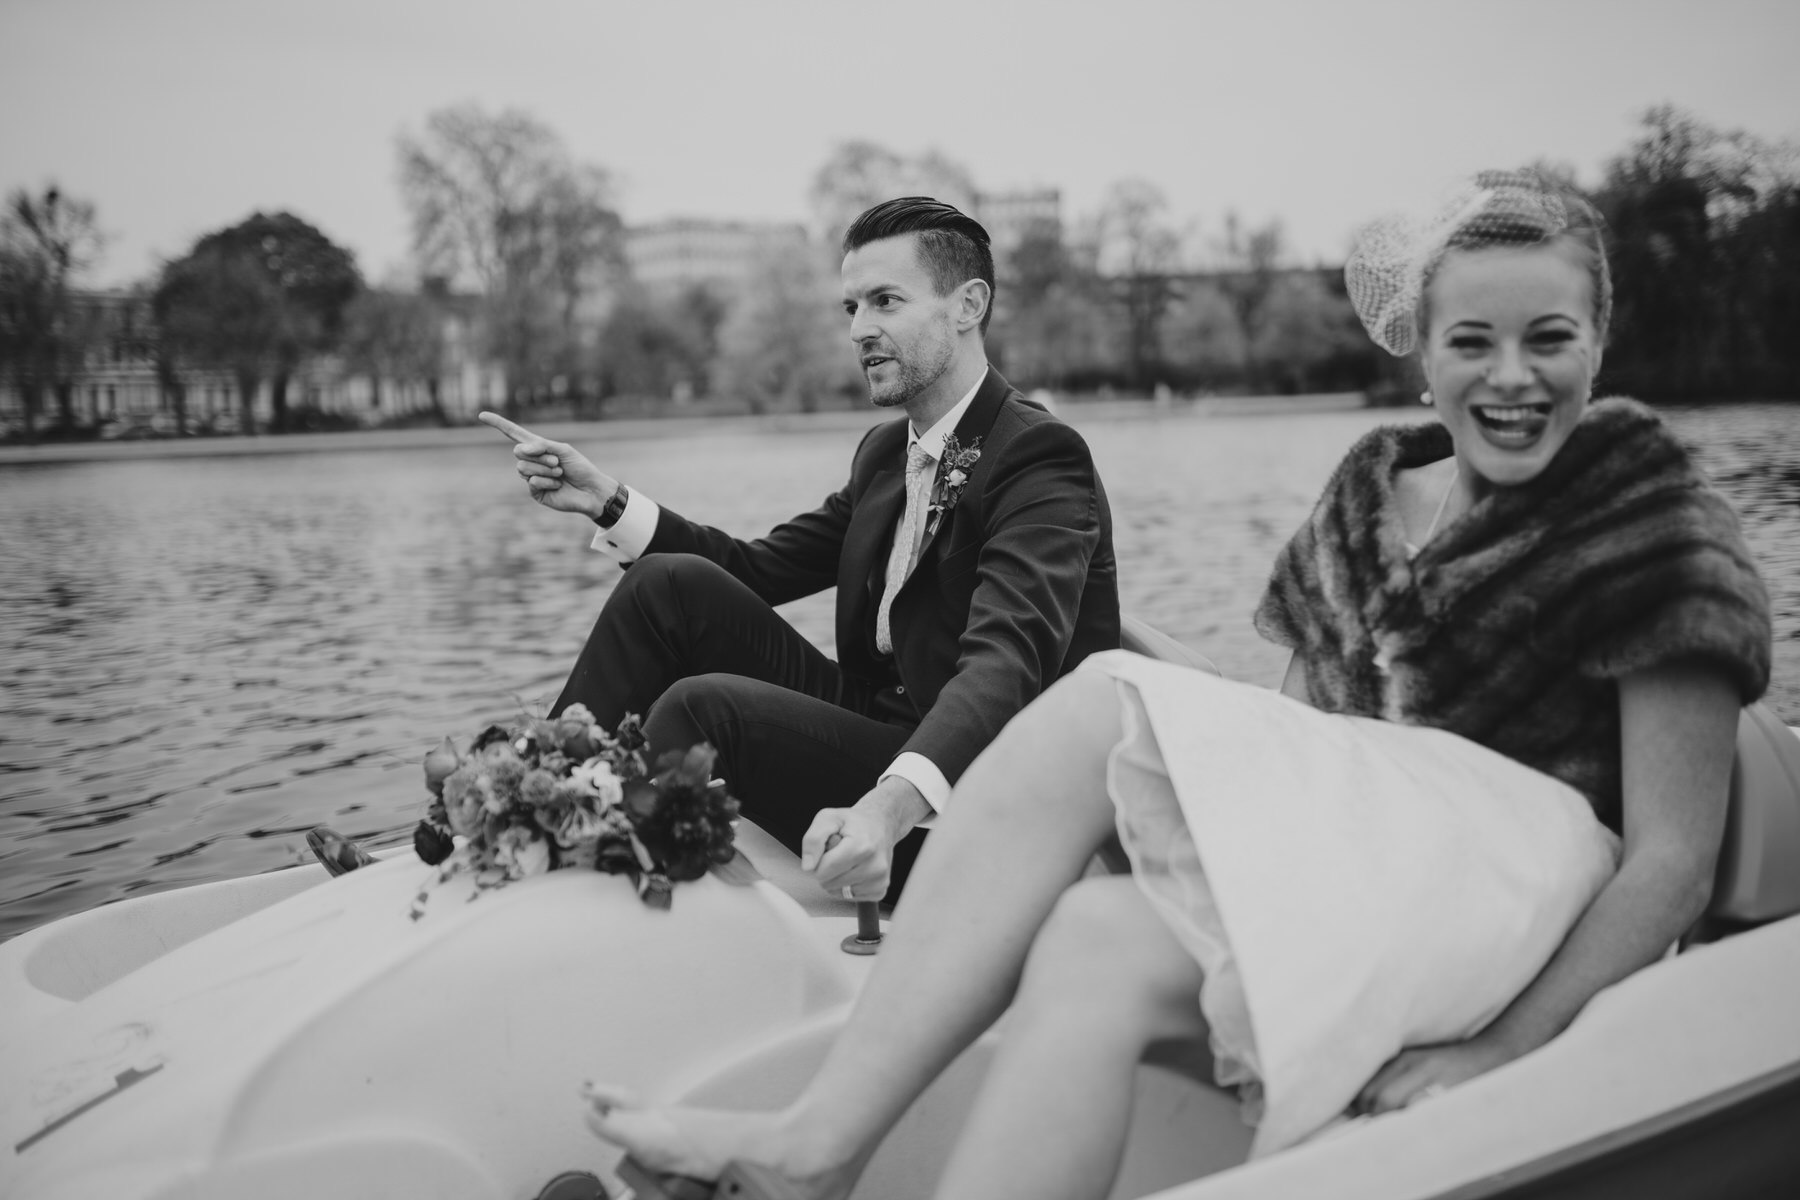 201-Victoria-park-Hackney-alternative-wedding.jpg